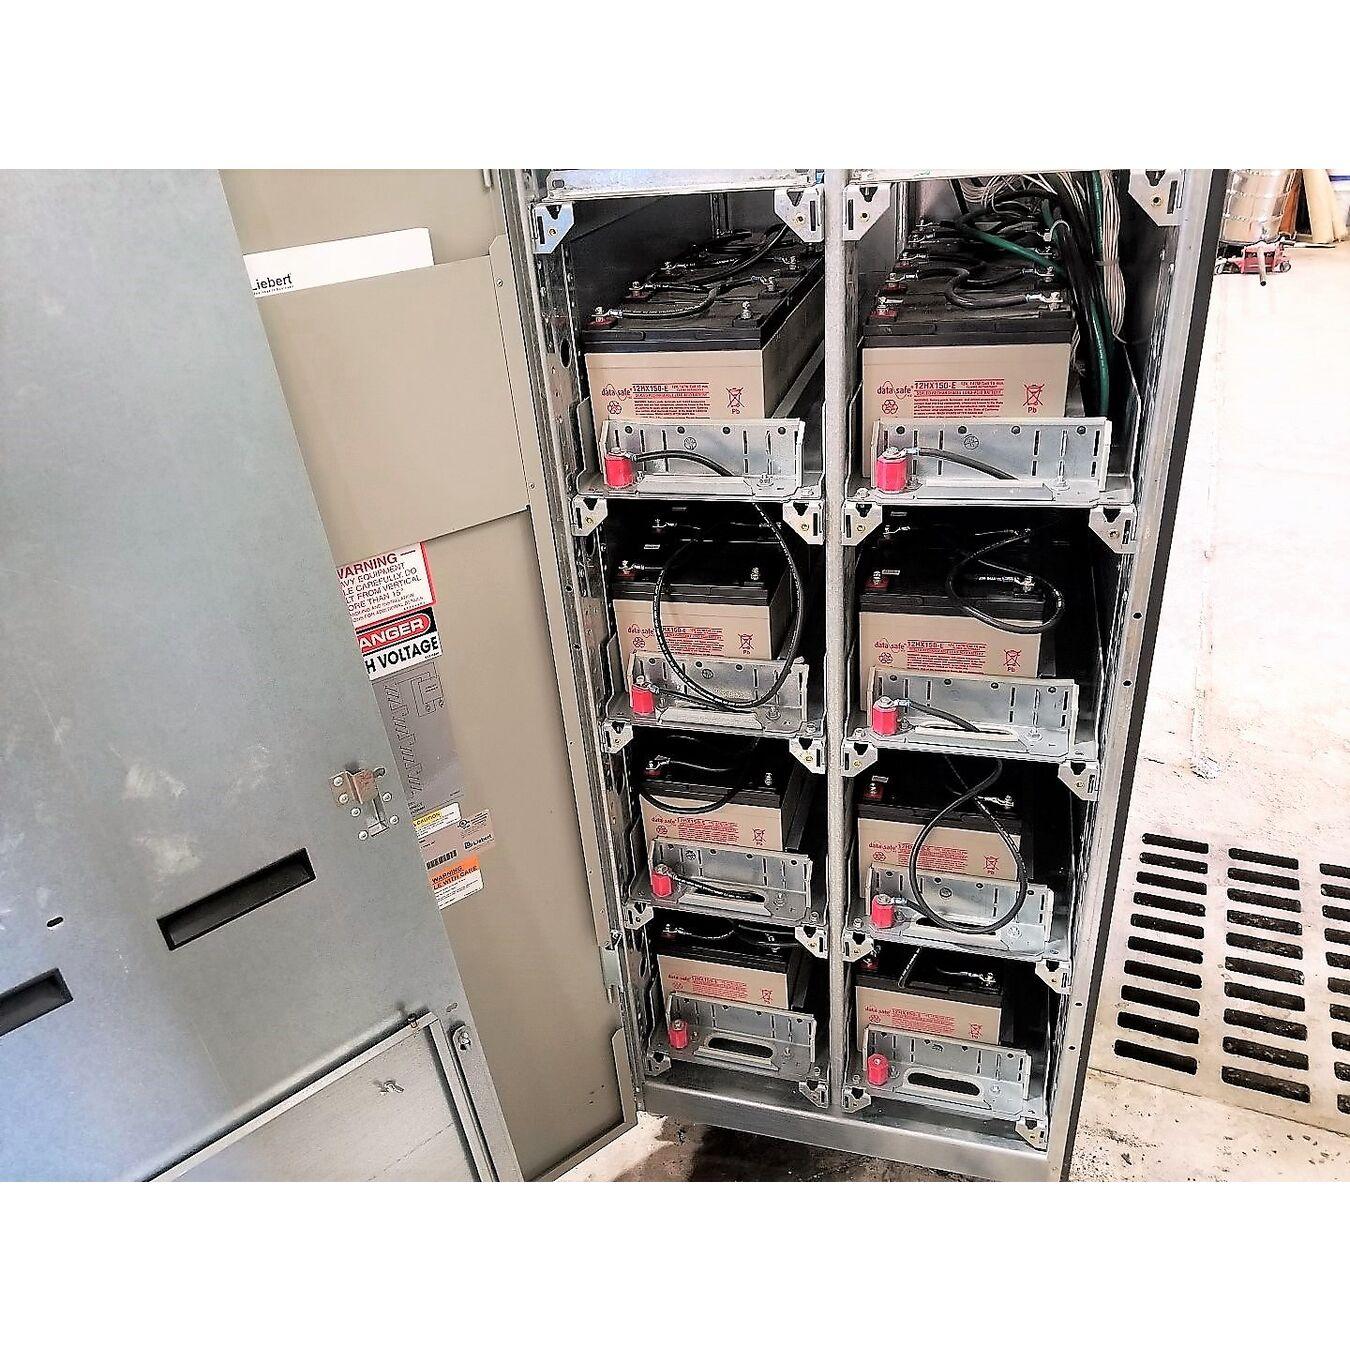 Schön 14 3 Wire Amp Rating Ideen - Schaltplan Serie Circuit ...